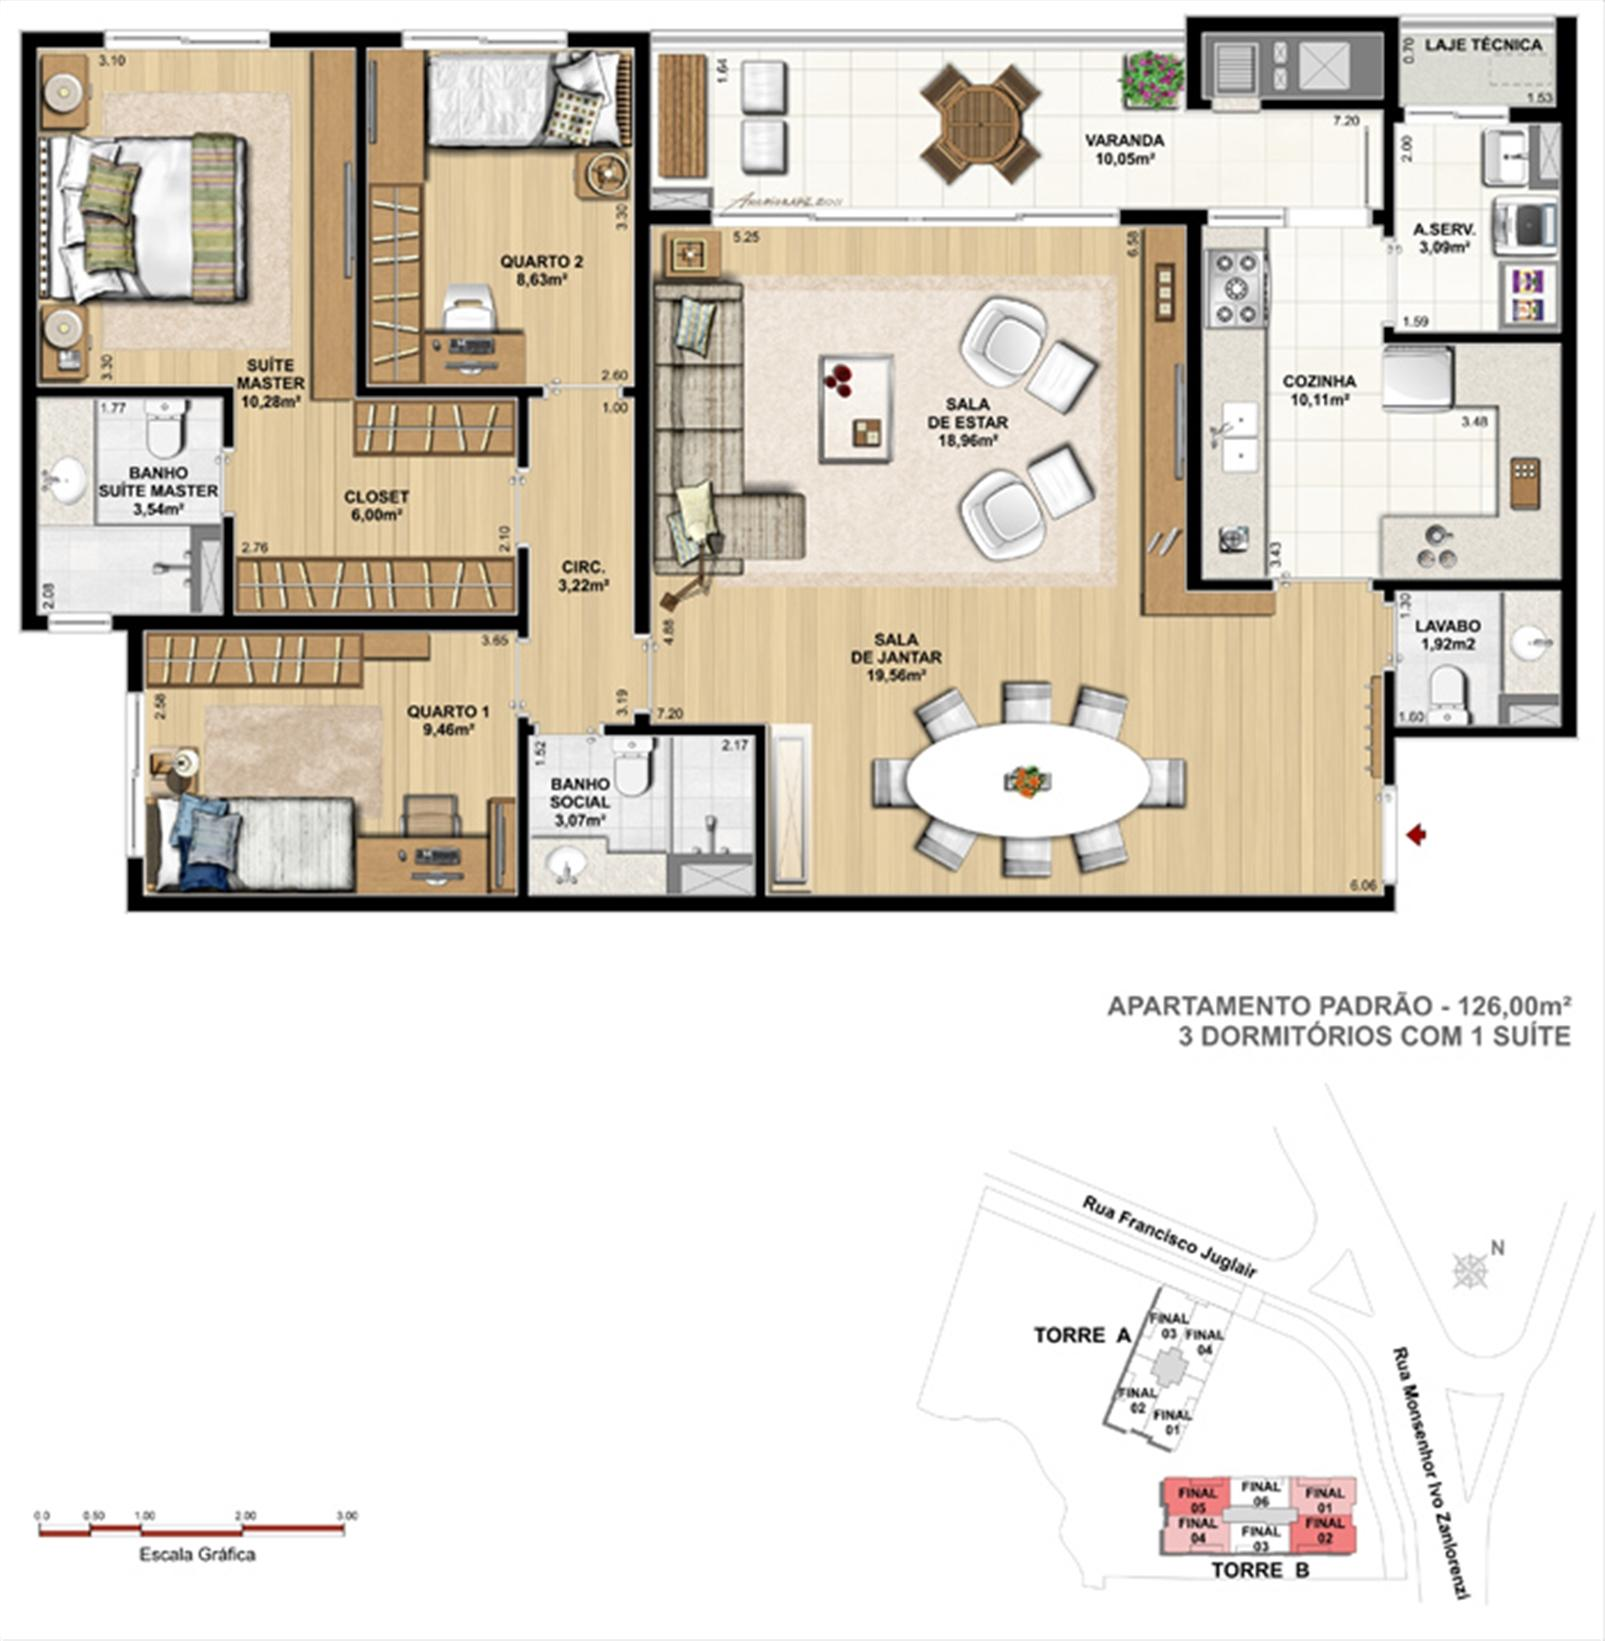 Torre 1  - 3 dormitórios com 1 suíte | Reserva Juglair Ecoville – Apartamentono  Ecoville - Curitiba - Paraná